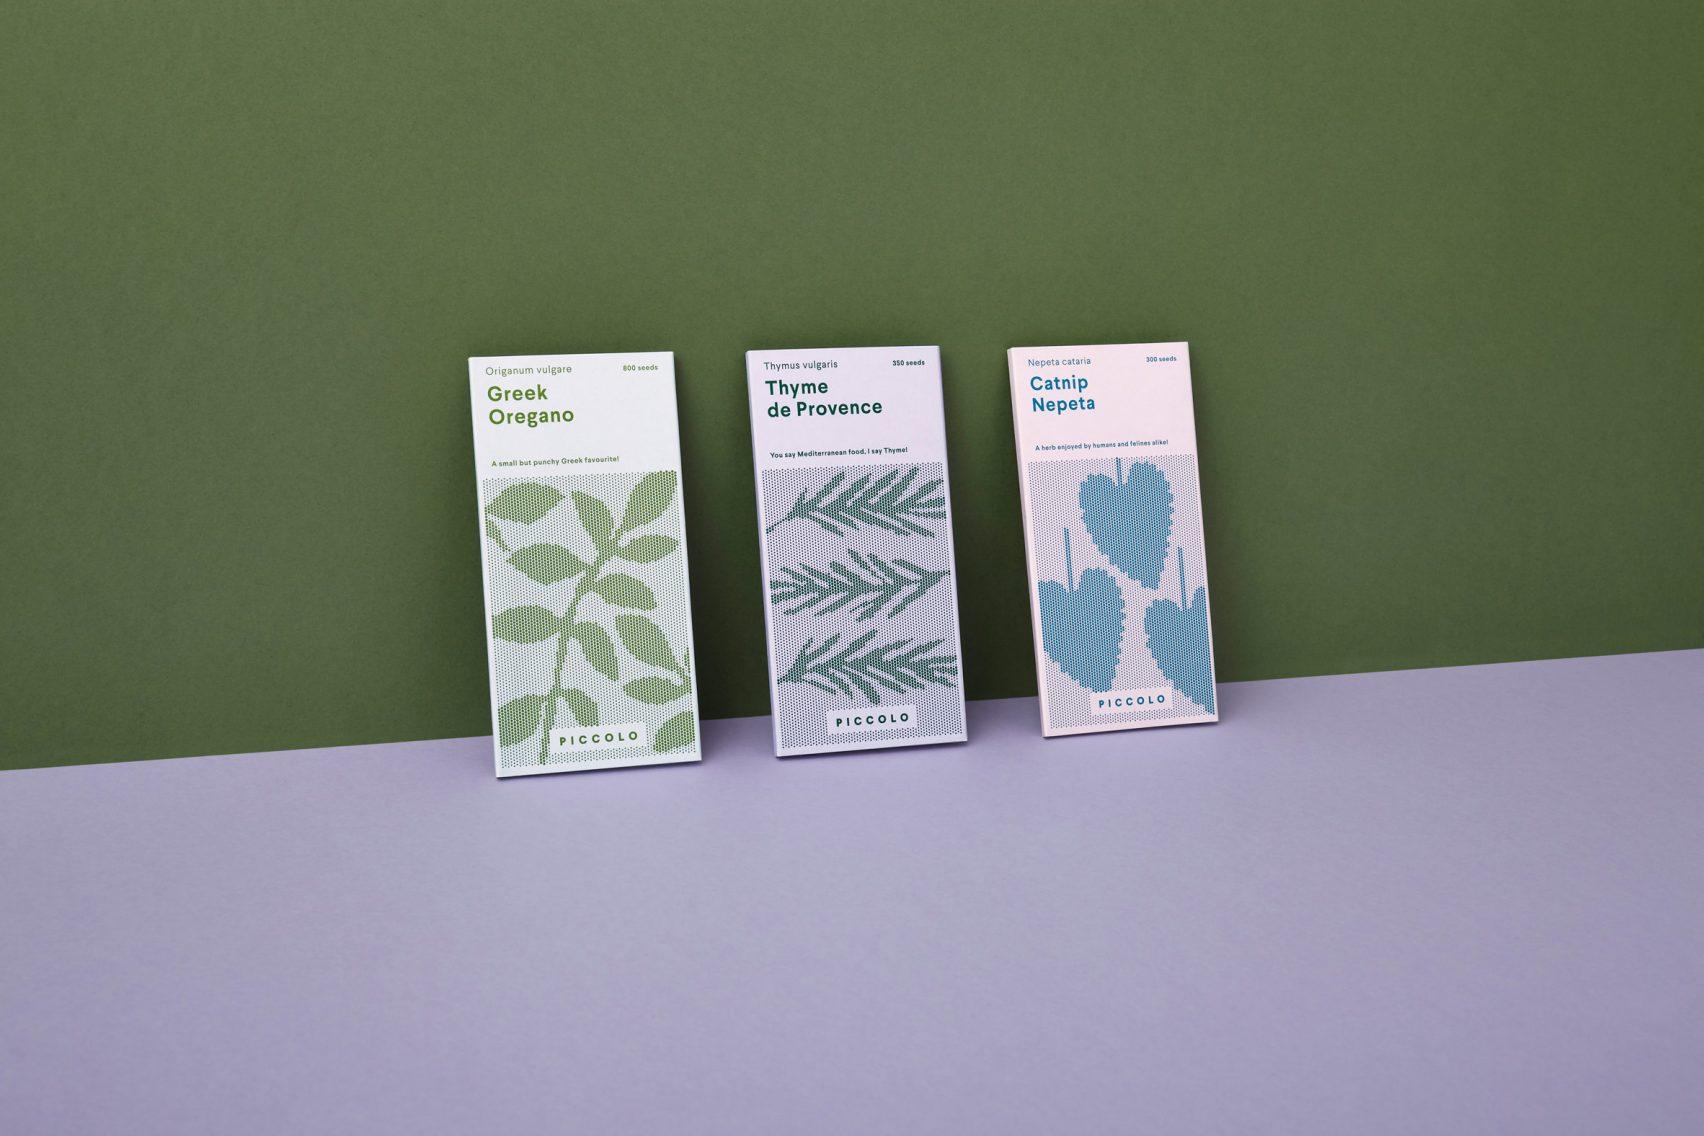 london-agency-here-design-piccolo-seeds-graphics-rebrand-_dezeen_2364_col_14-1704x1136.jpg